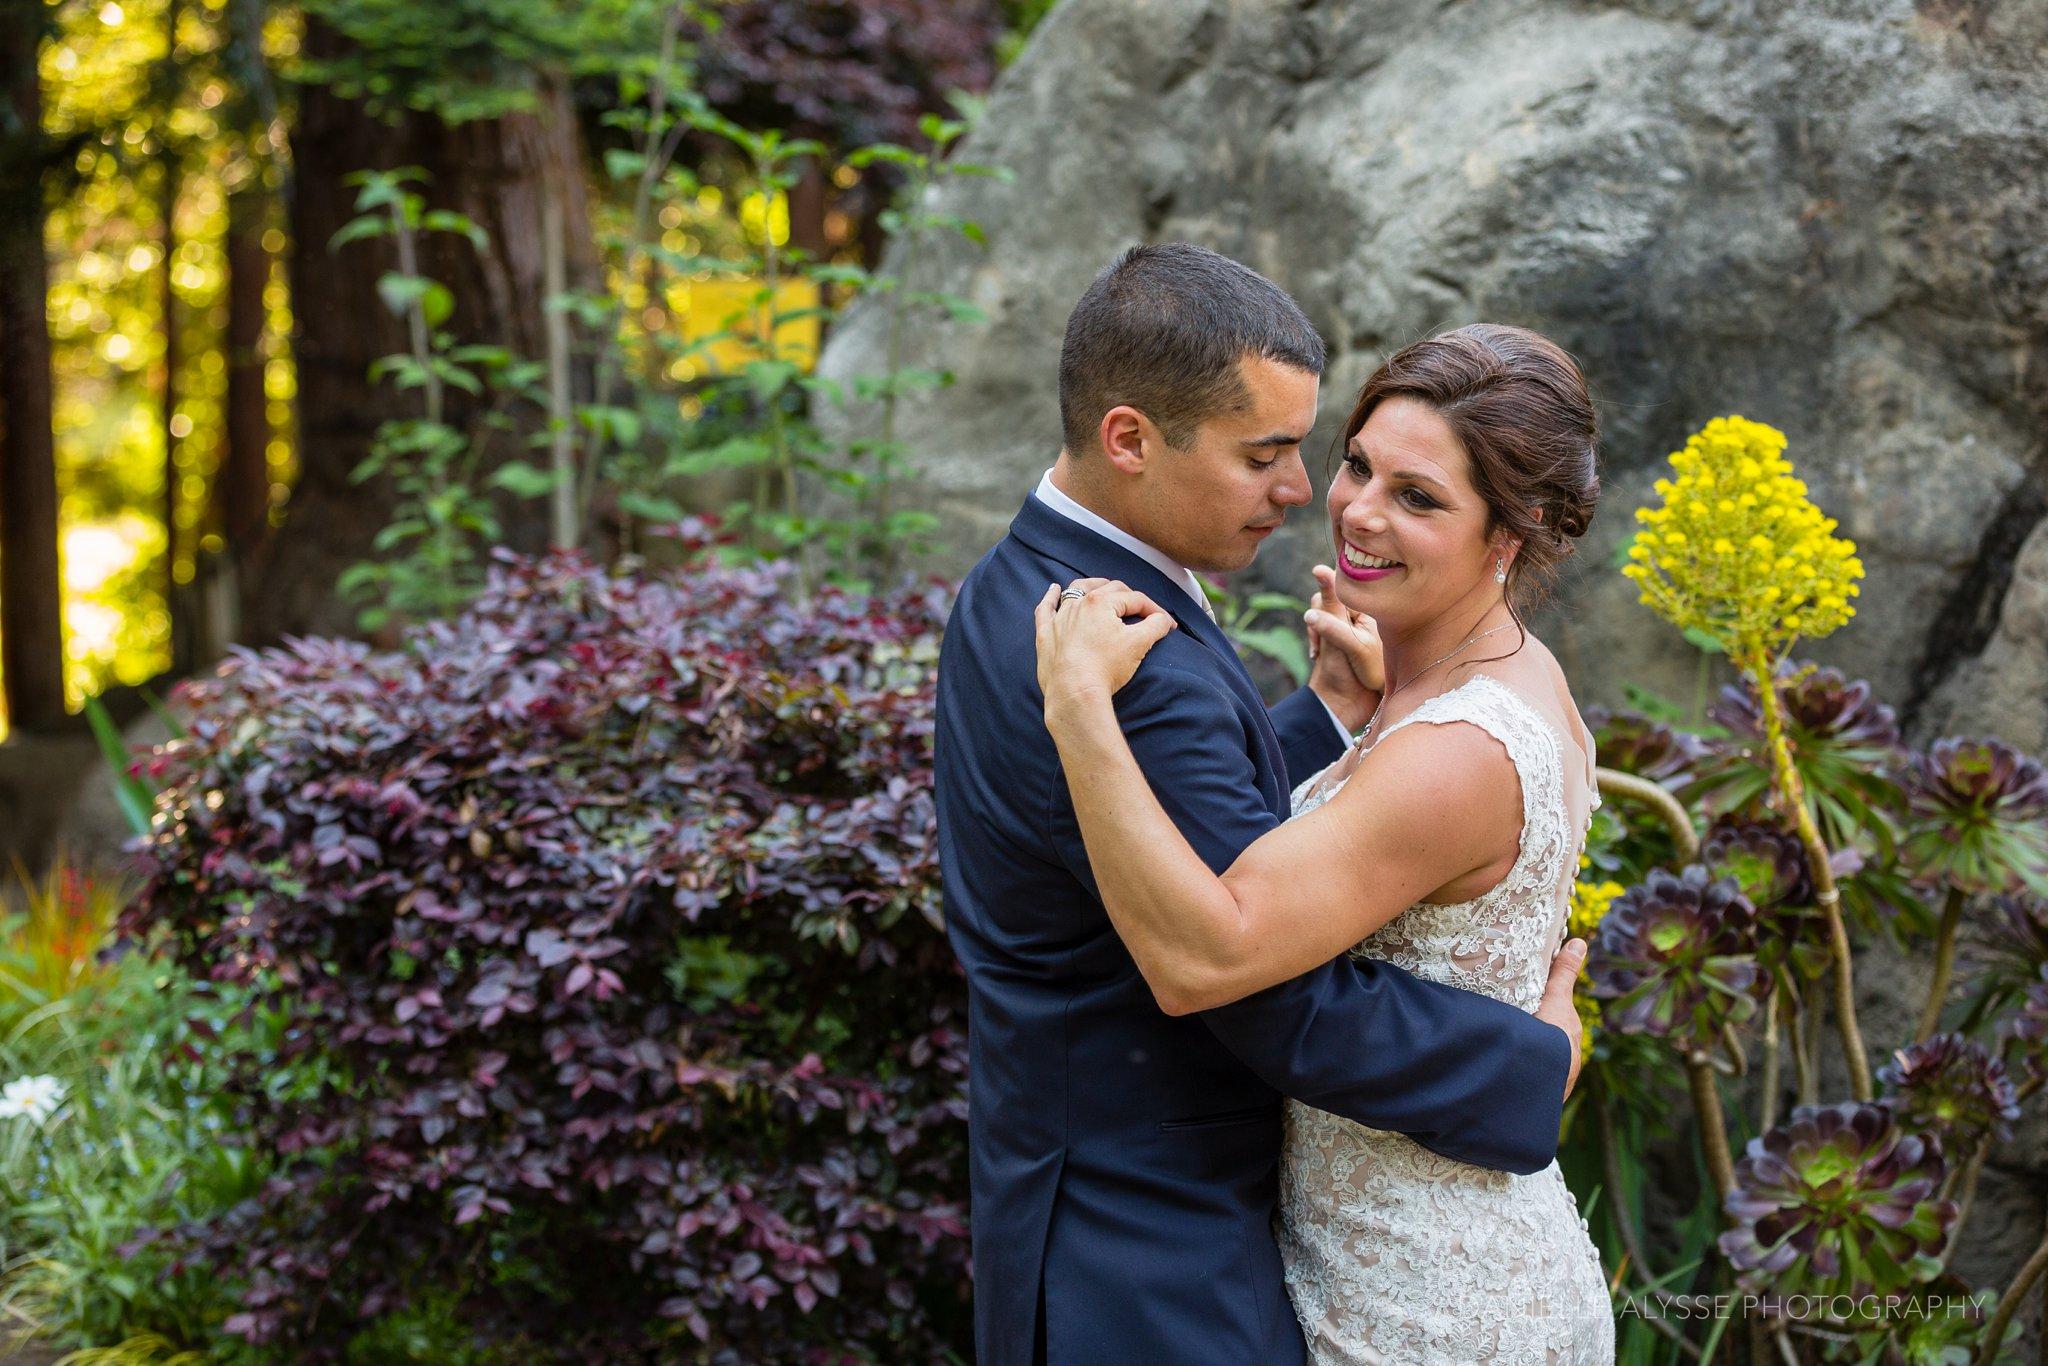 170429_blog_kimberly_ben_wedding_san_mateo_curiodyssey_danielle_alysse_photography_sacramento_photographer0408_WEB.jpg